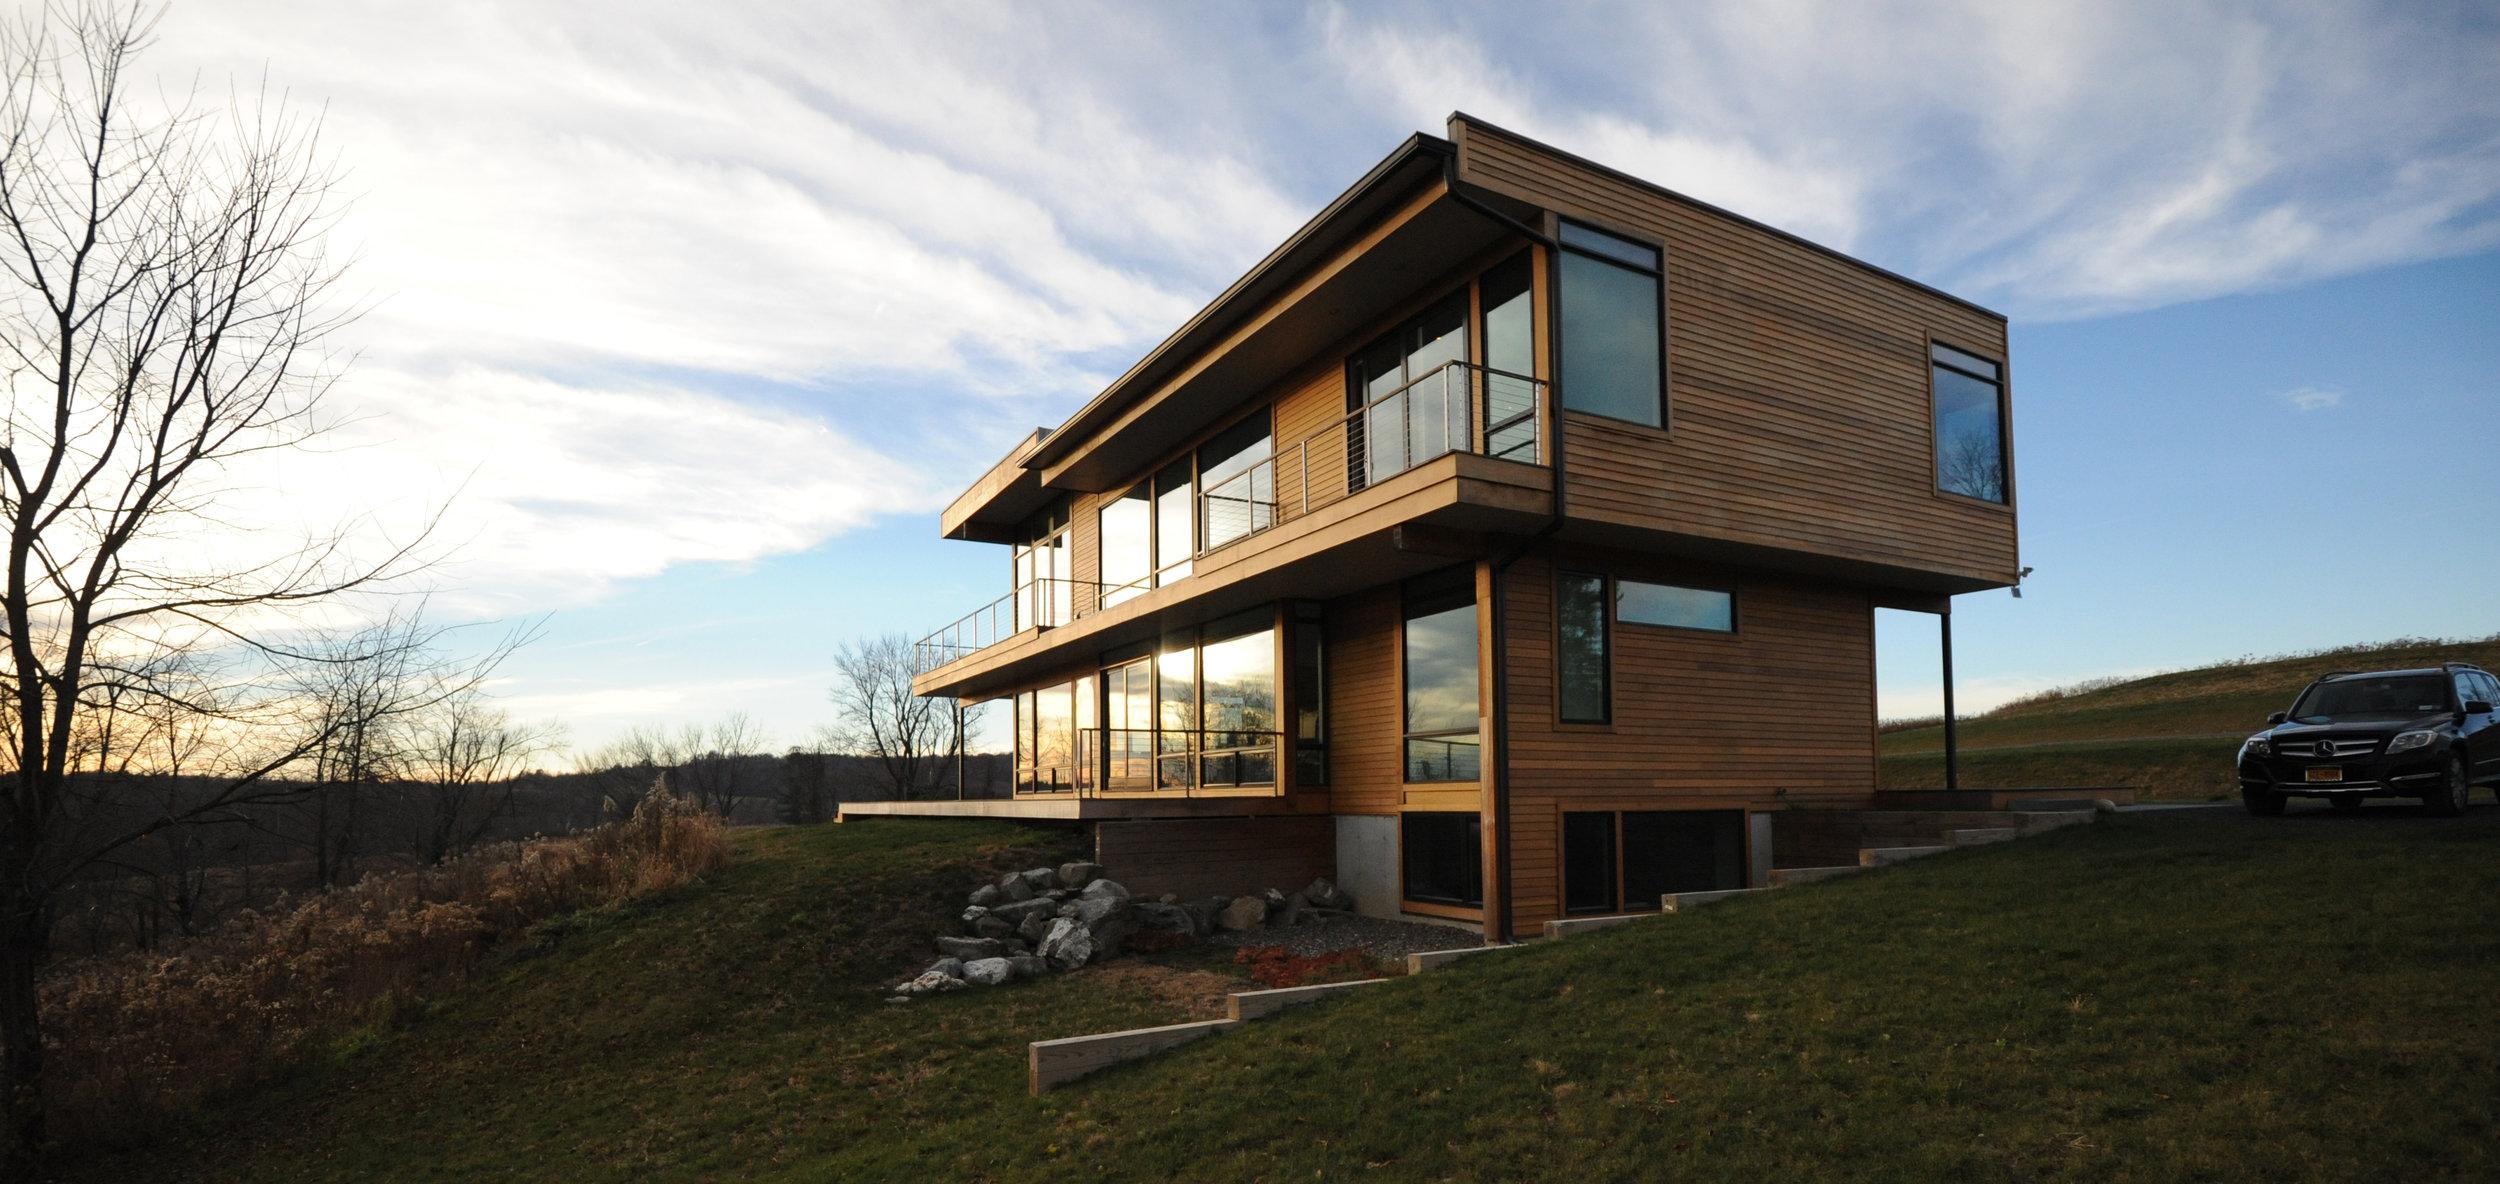 turkel_modern_design_prefab_home_writers_retreat_exterior_evening.jpg